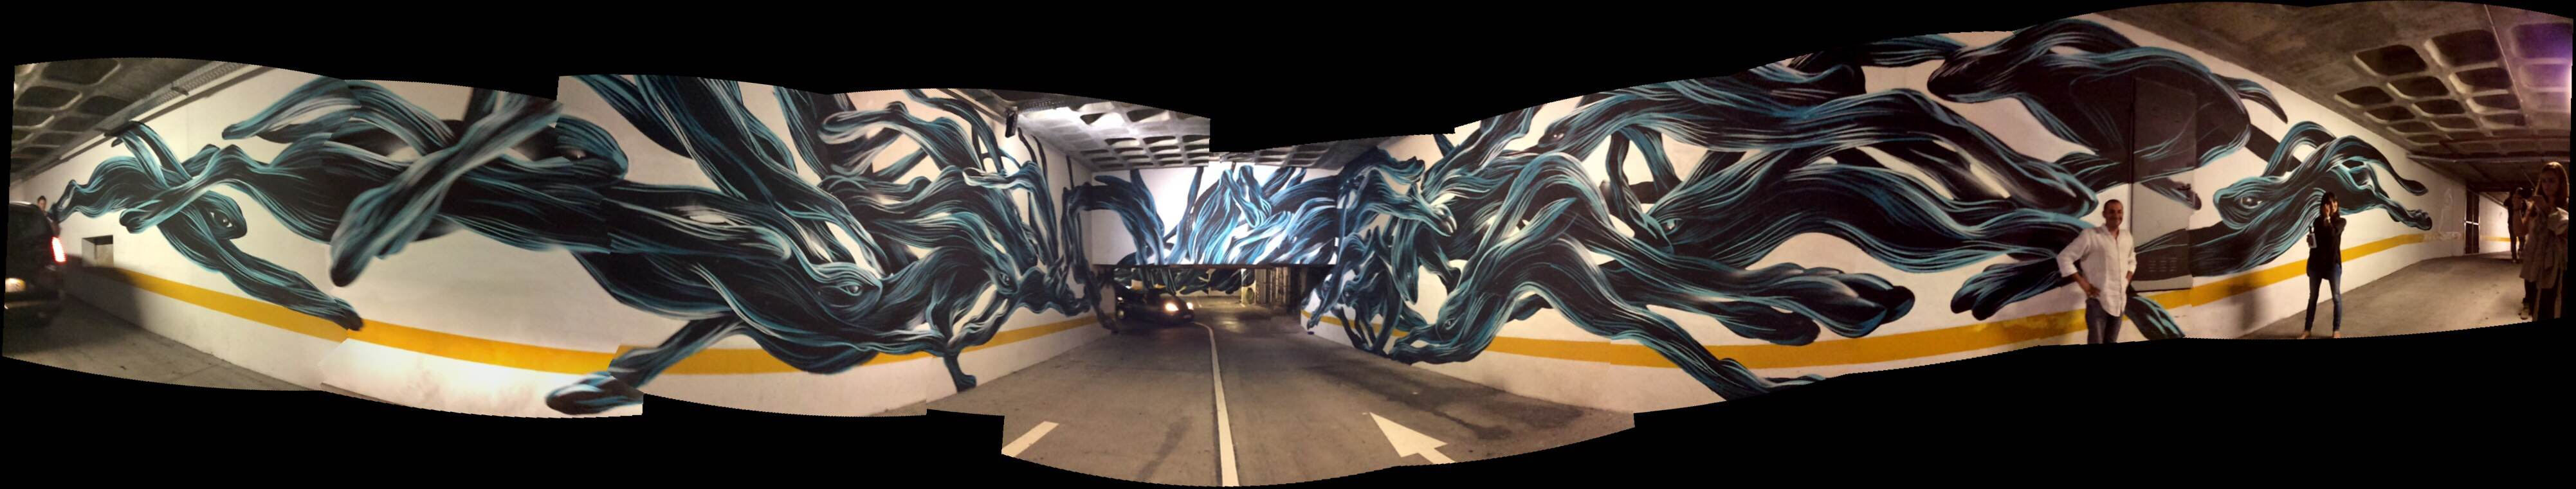 brooklyn-street-art-pantonio-francisco-gomes-lisbon-09-14-3